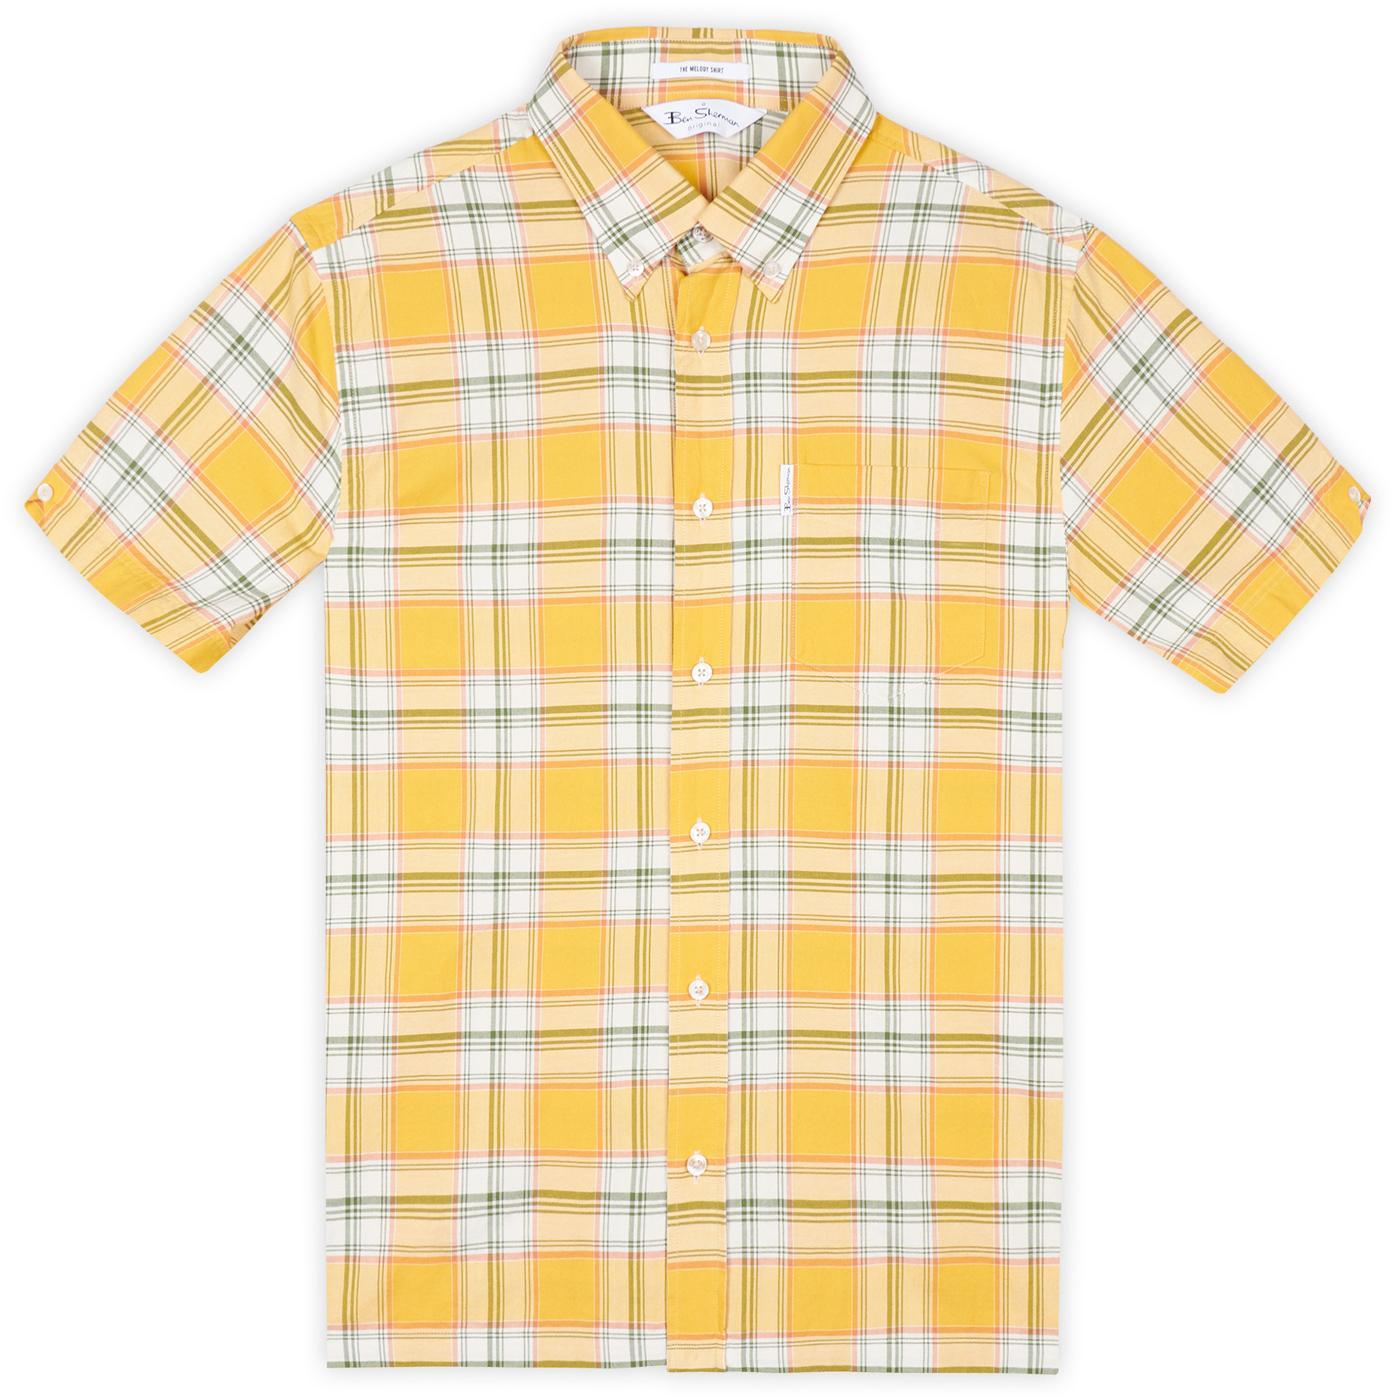 BEN SHERMAN Archive 90s Melody Madras Check Shirt